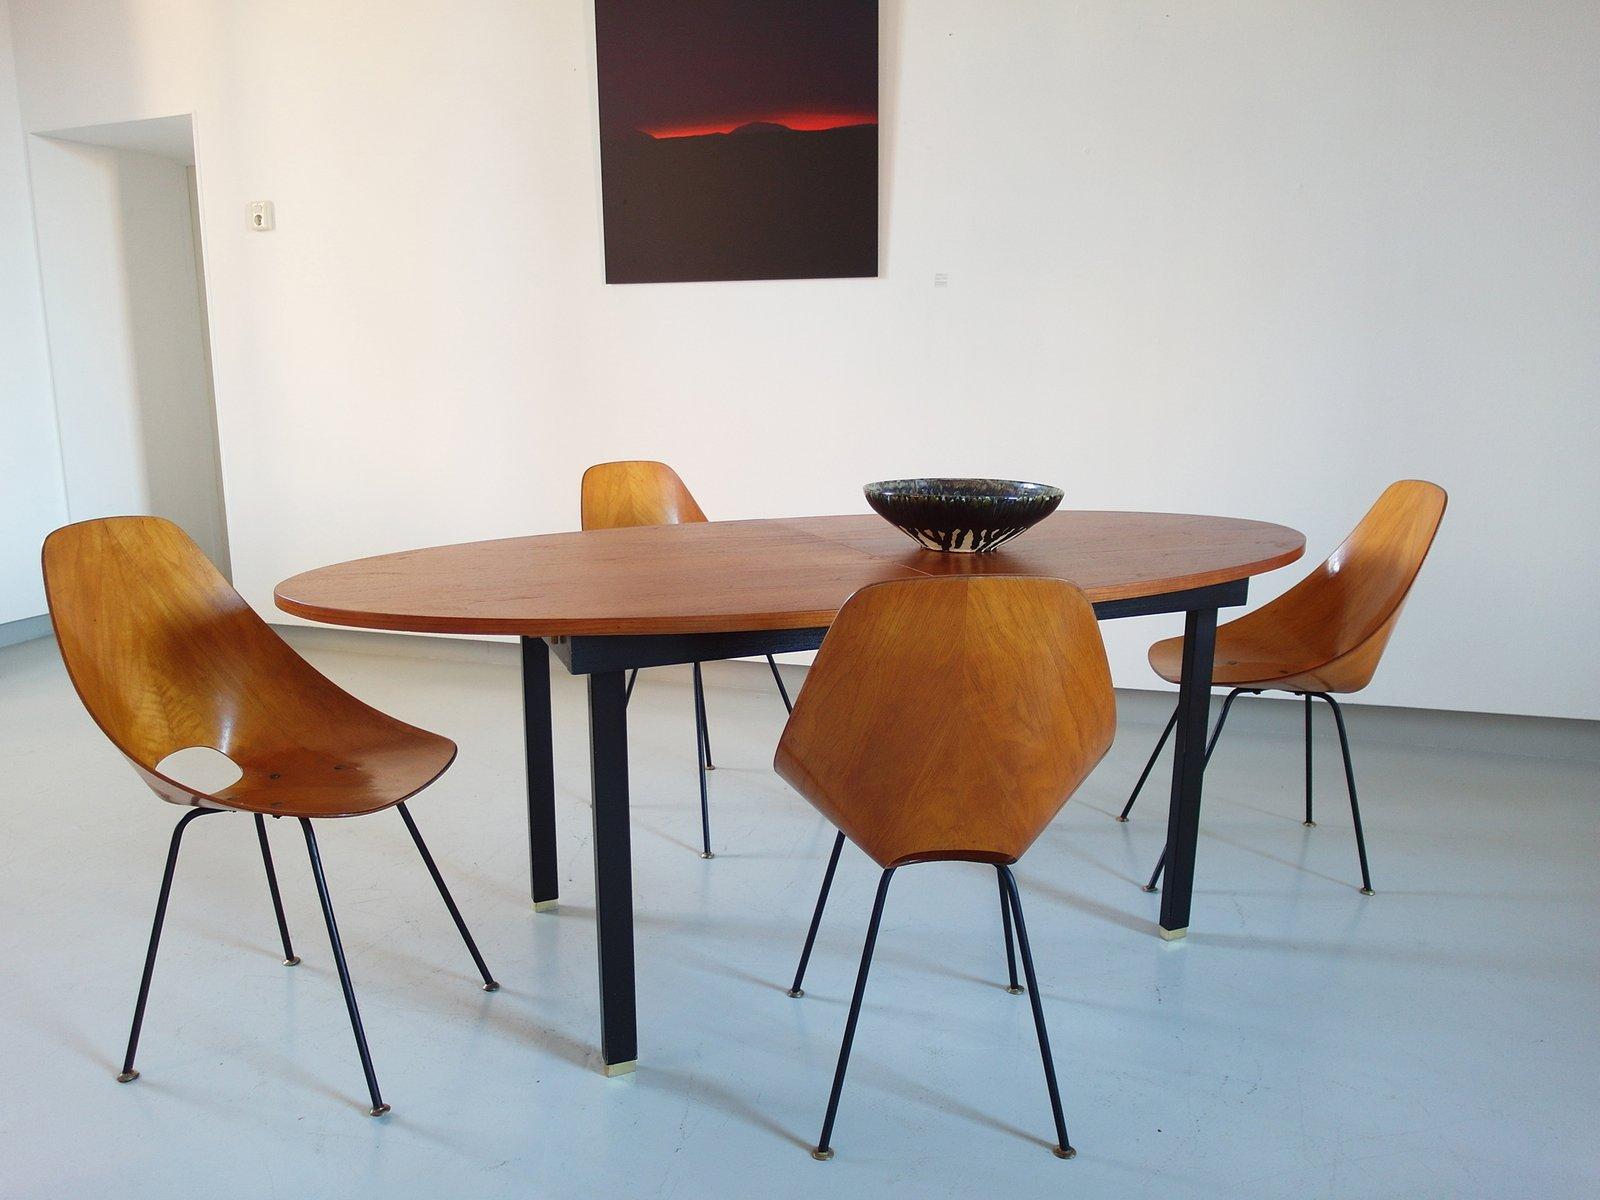 Tavolo da pranzo ovale allungabile in teak ed ottone anni for Tavolo da pranzo ovale